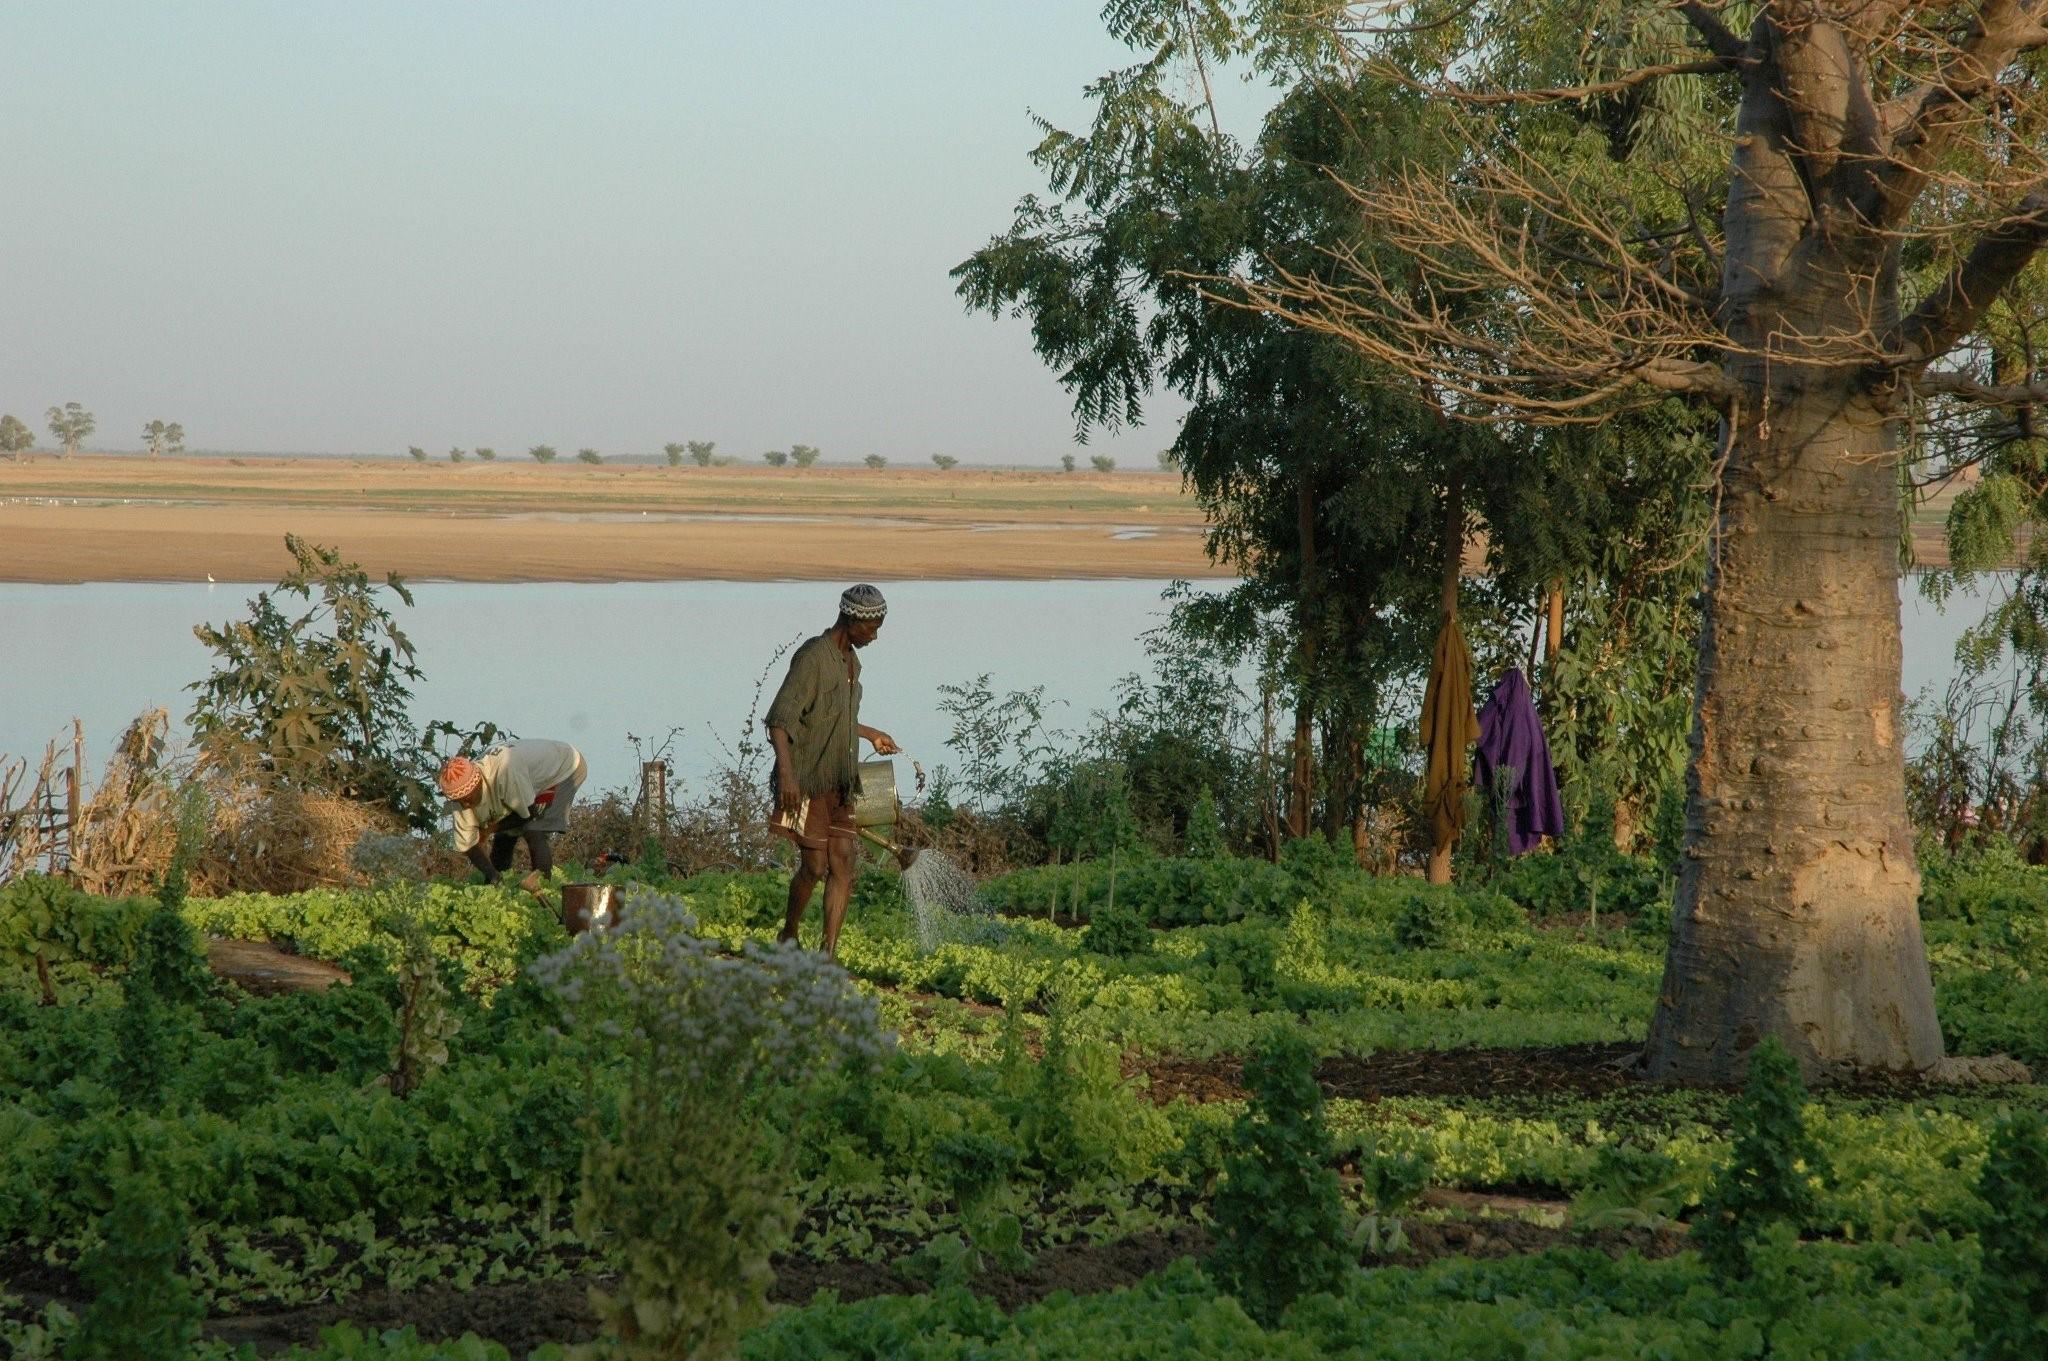 Un îlot de verdure/Mopti/Mali Février 2007